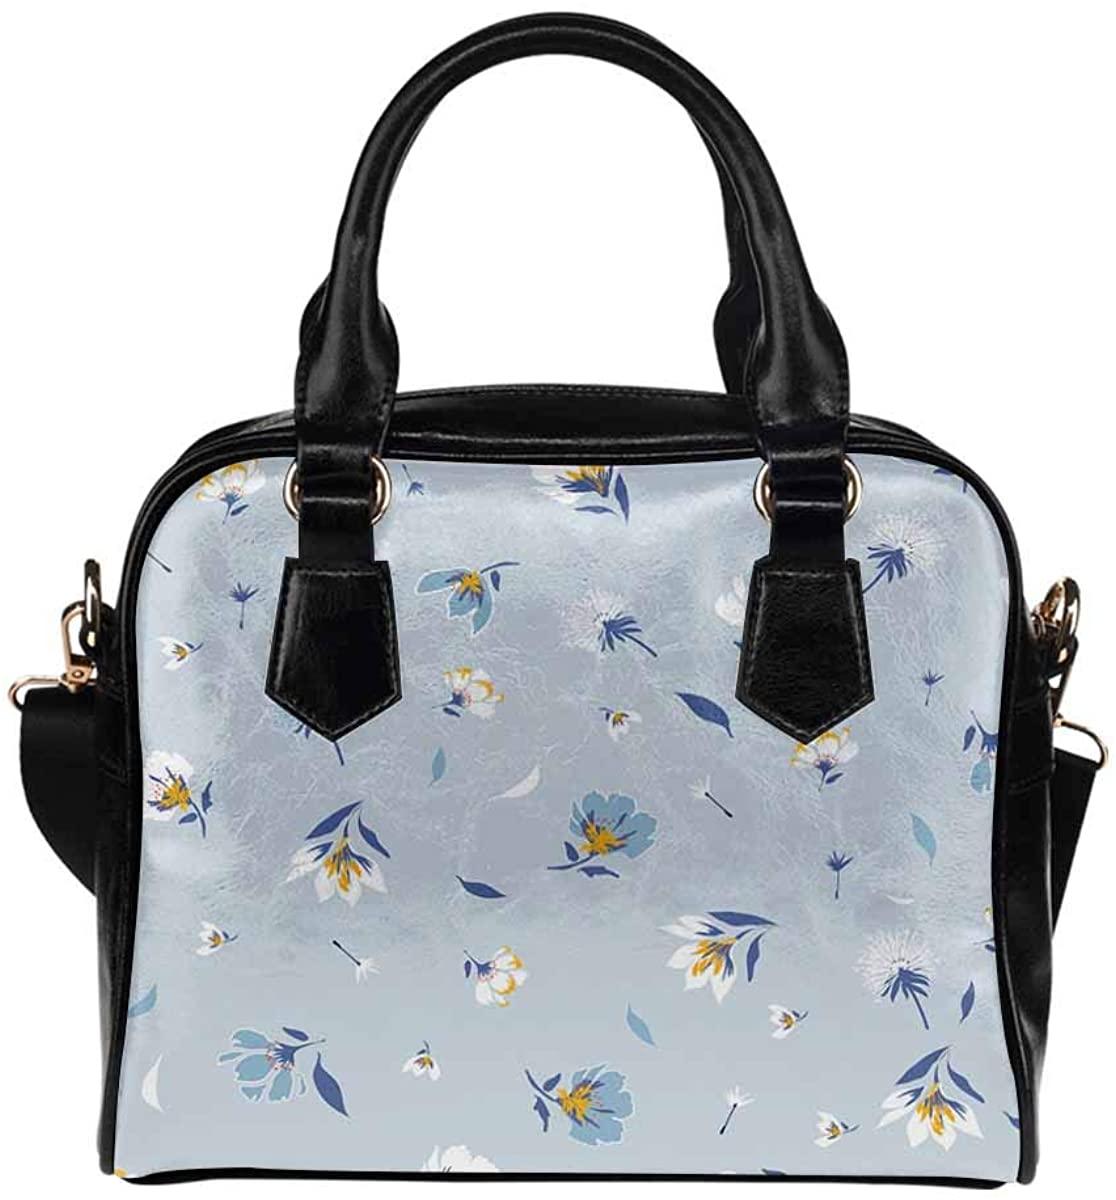 INTERESTPRINT Blooming Botanical Motifs Crossbody Purse Bags for Women Shoulder Bag